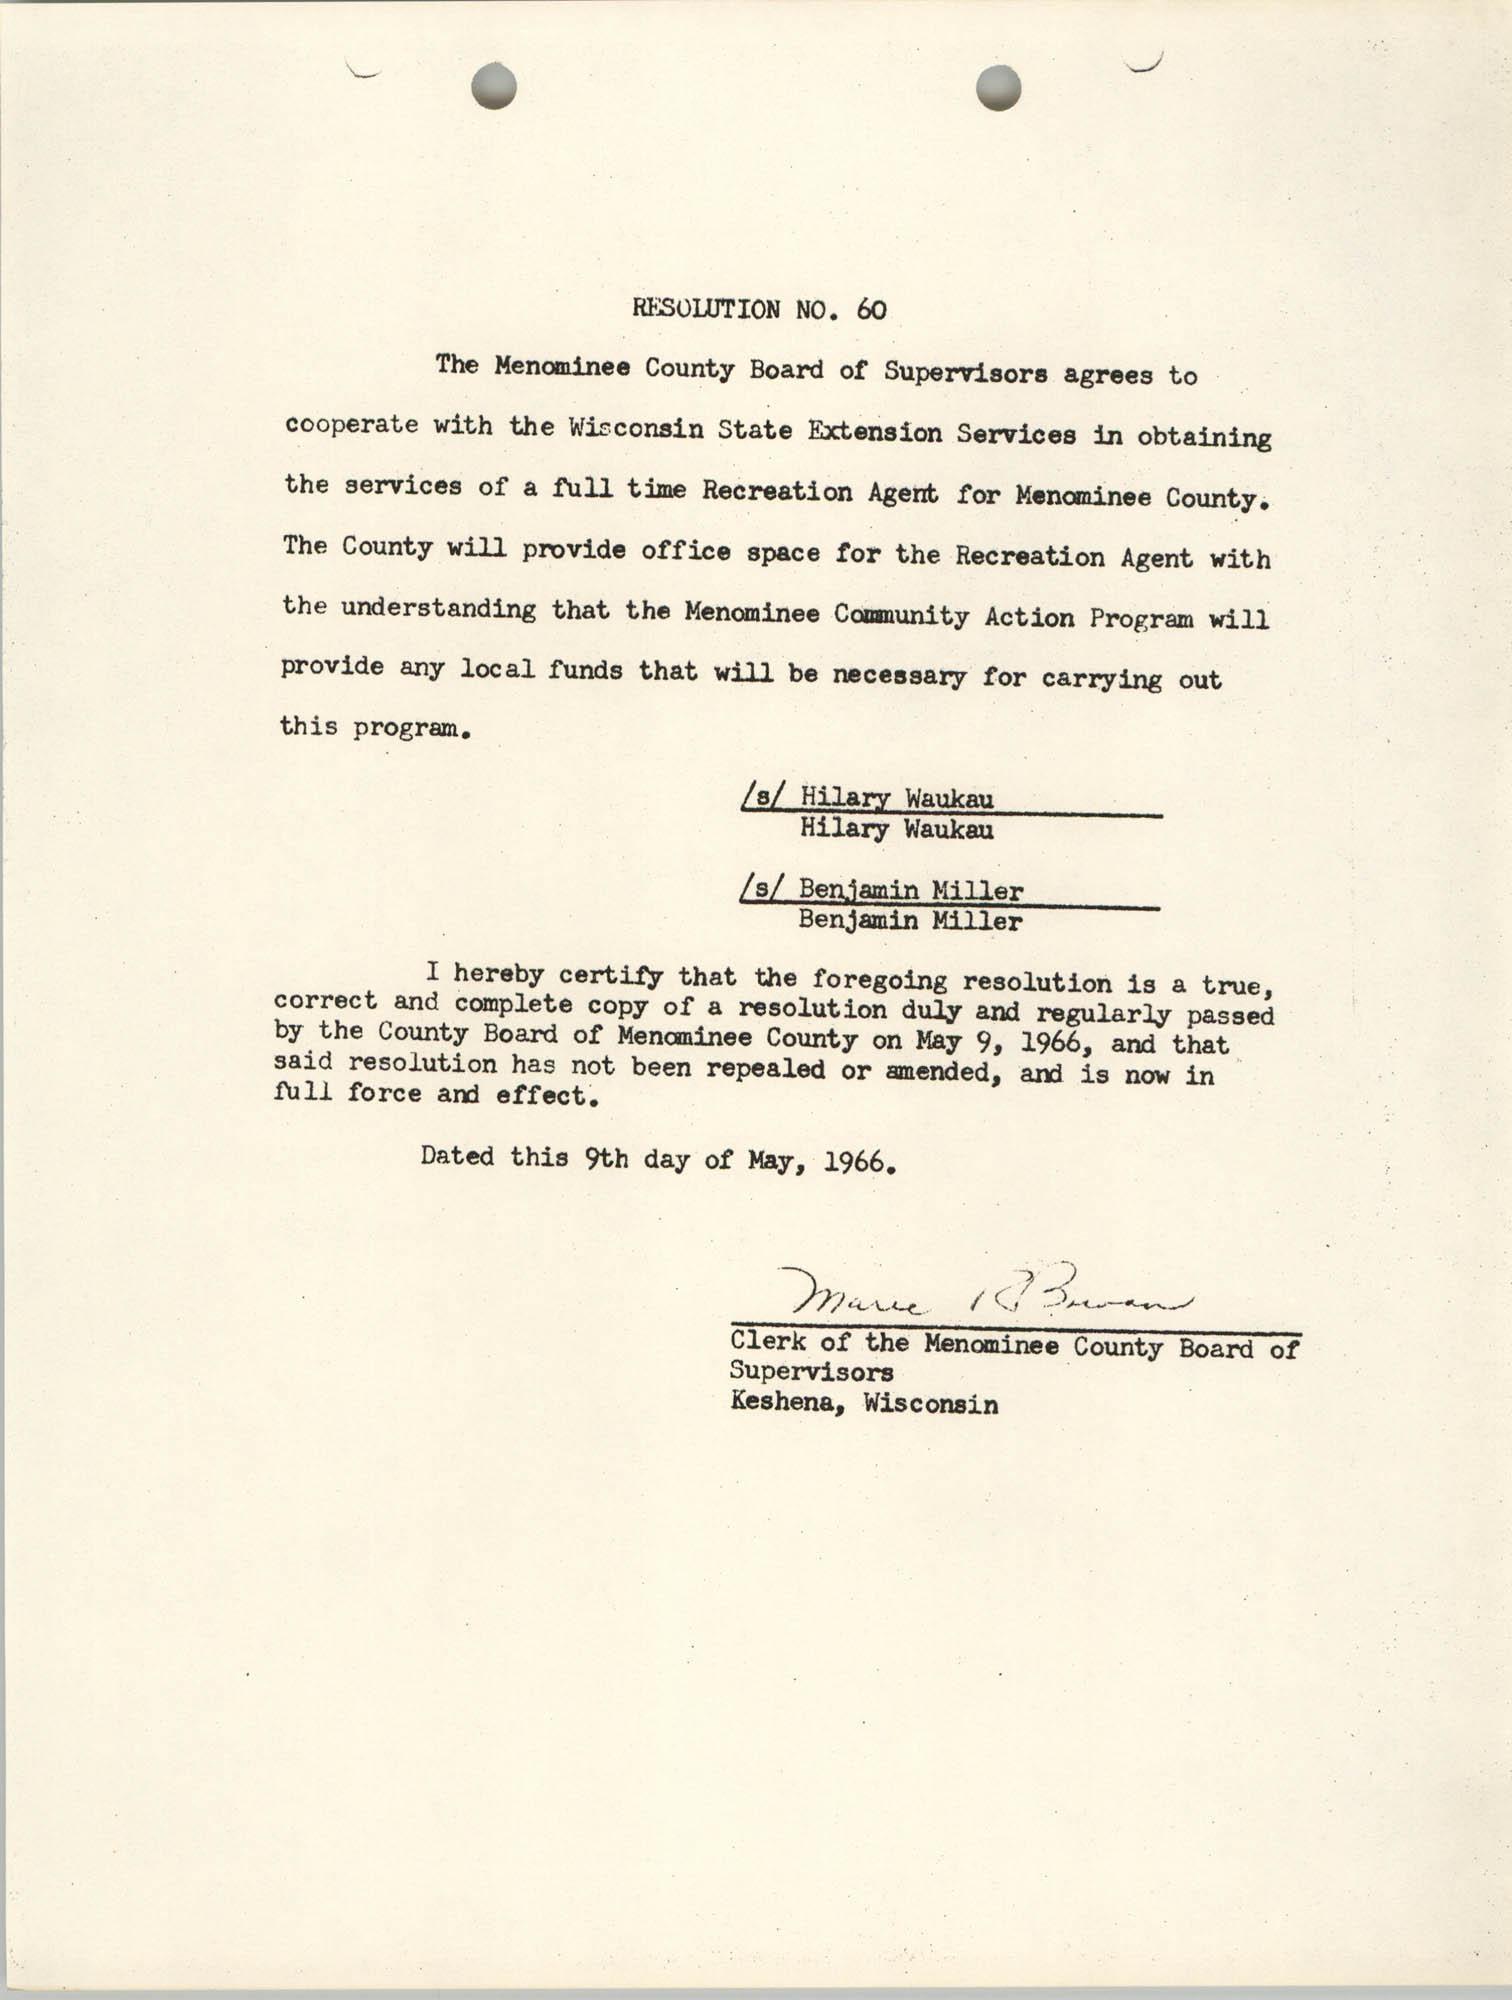 Resolution No. 60